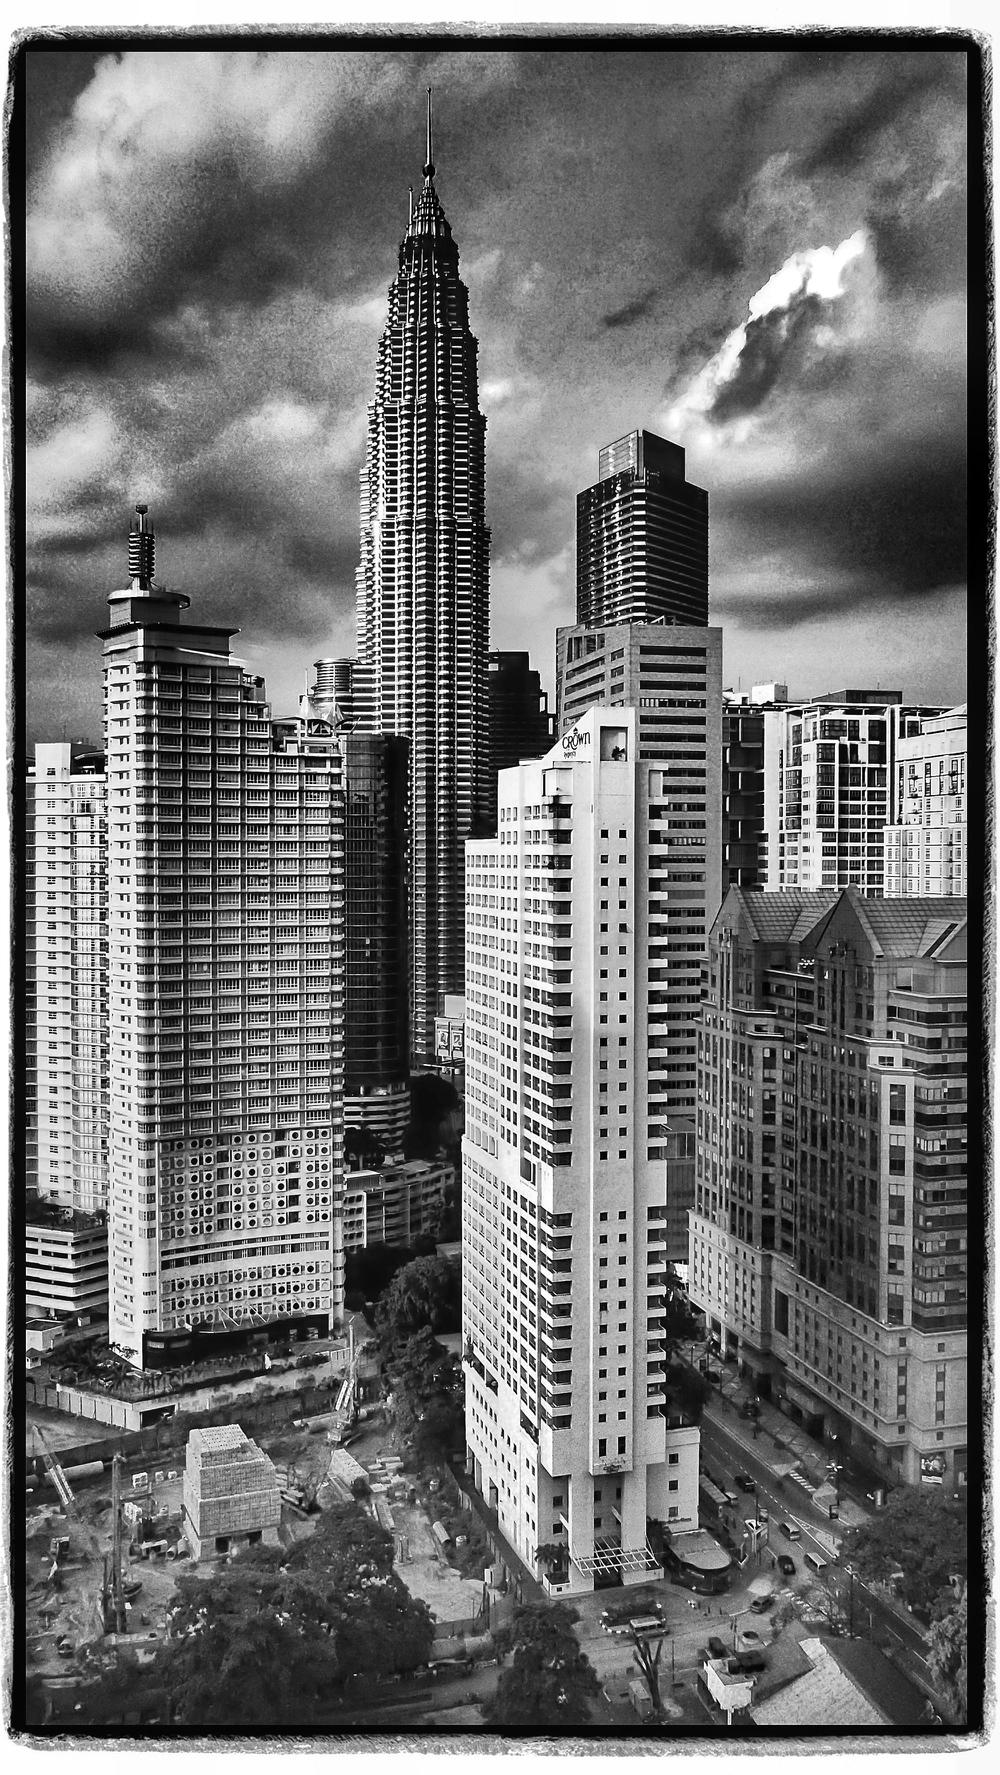 Kuala Lumpur & Petronas Towers